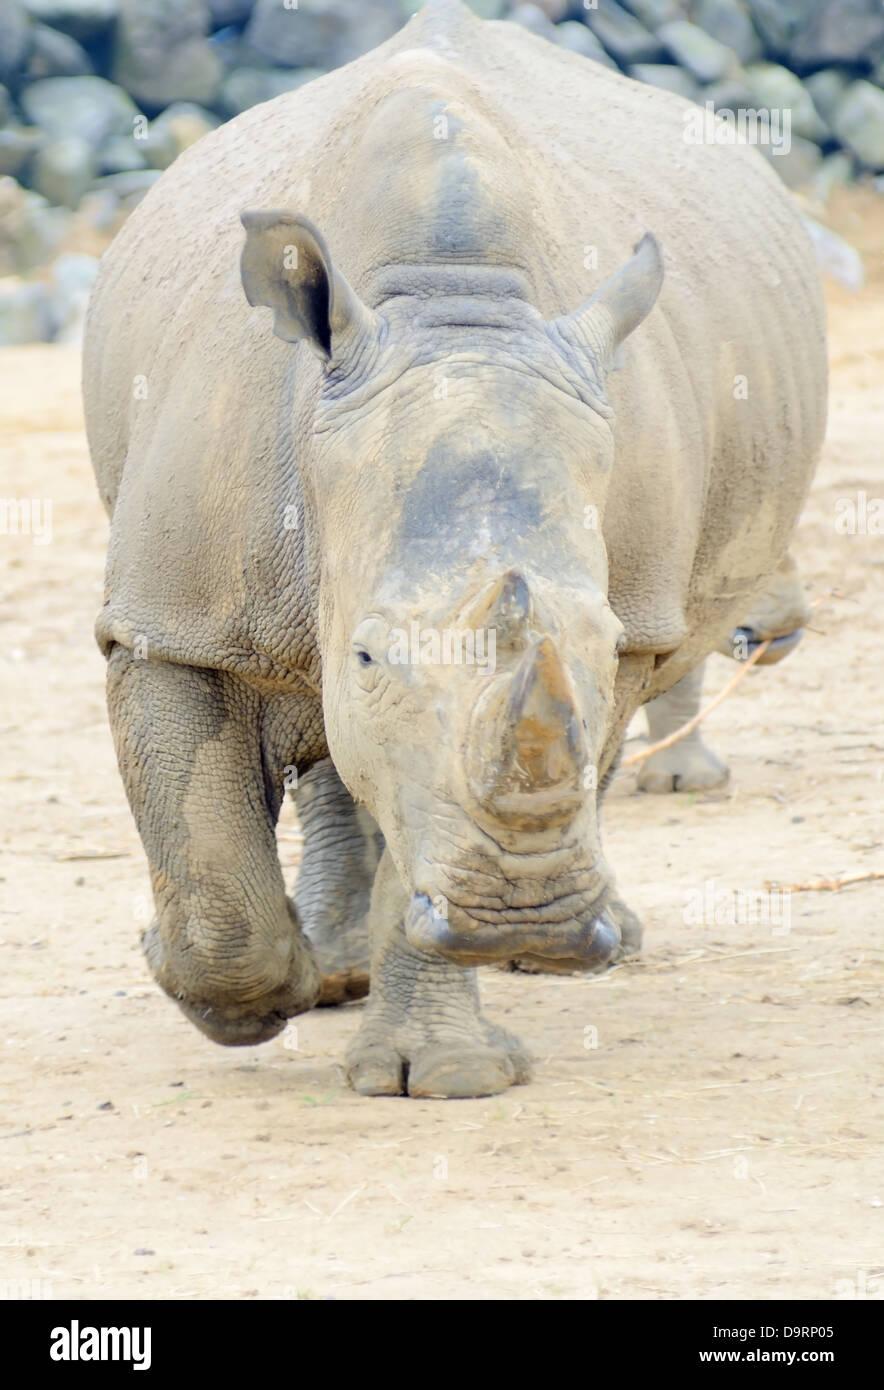 Rhinoceros charging straight at camera looking dangerous - Stock Image